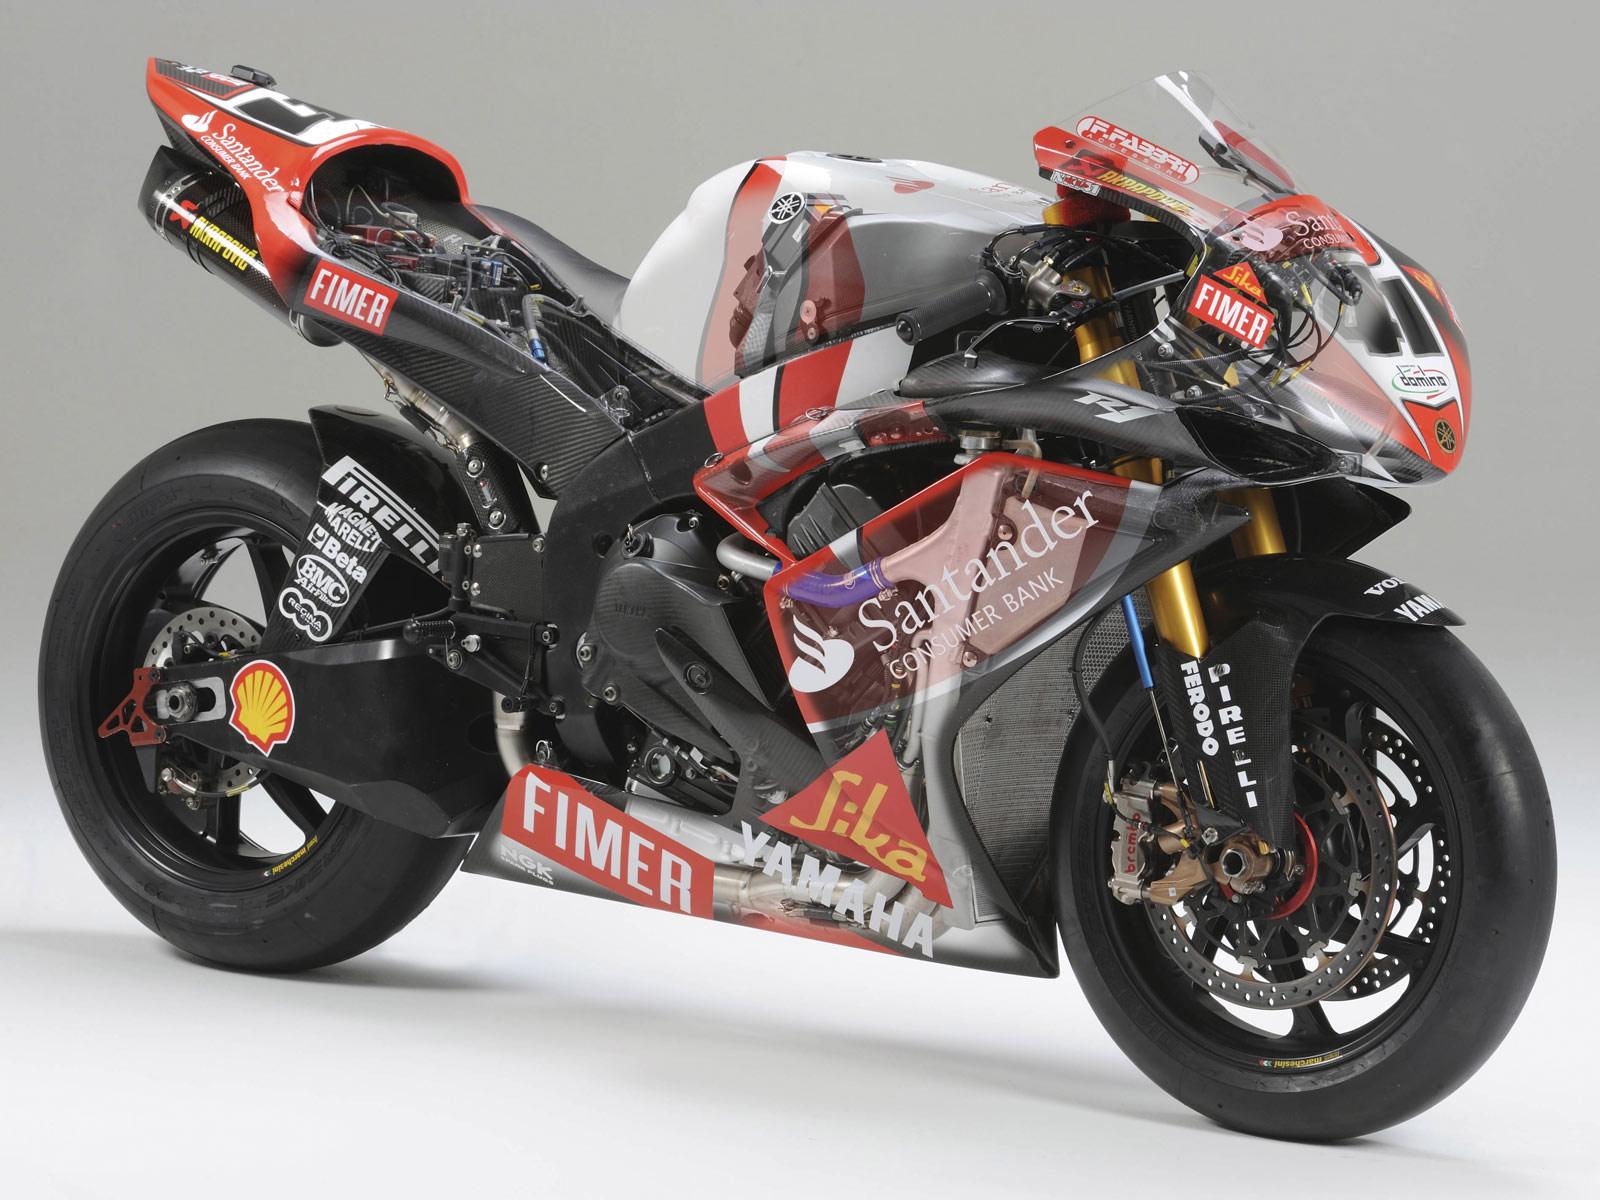 http://3.bp.blogspot.com/-JieIMYGwy8U/TuD-QmLXDmI/AAAAAAAAUH4/f37CPAbW8PY/s1600/Yamaha-Motorcycles-Wallpapers-Picture-9.jpg